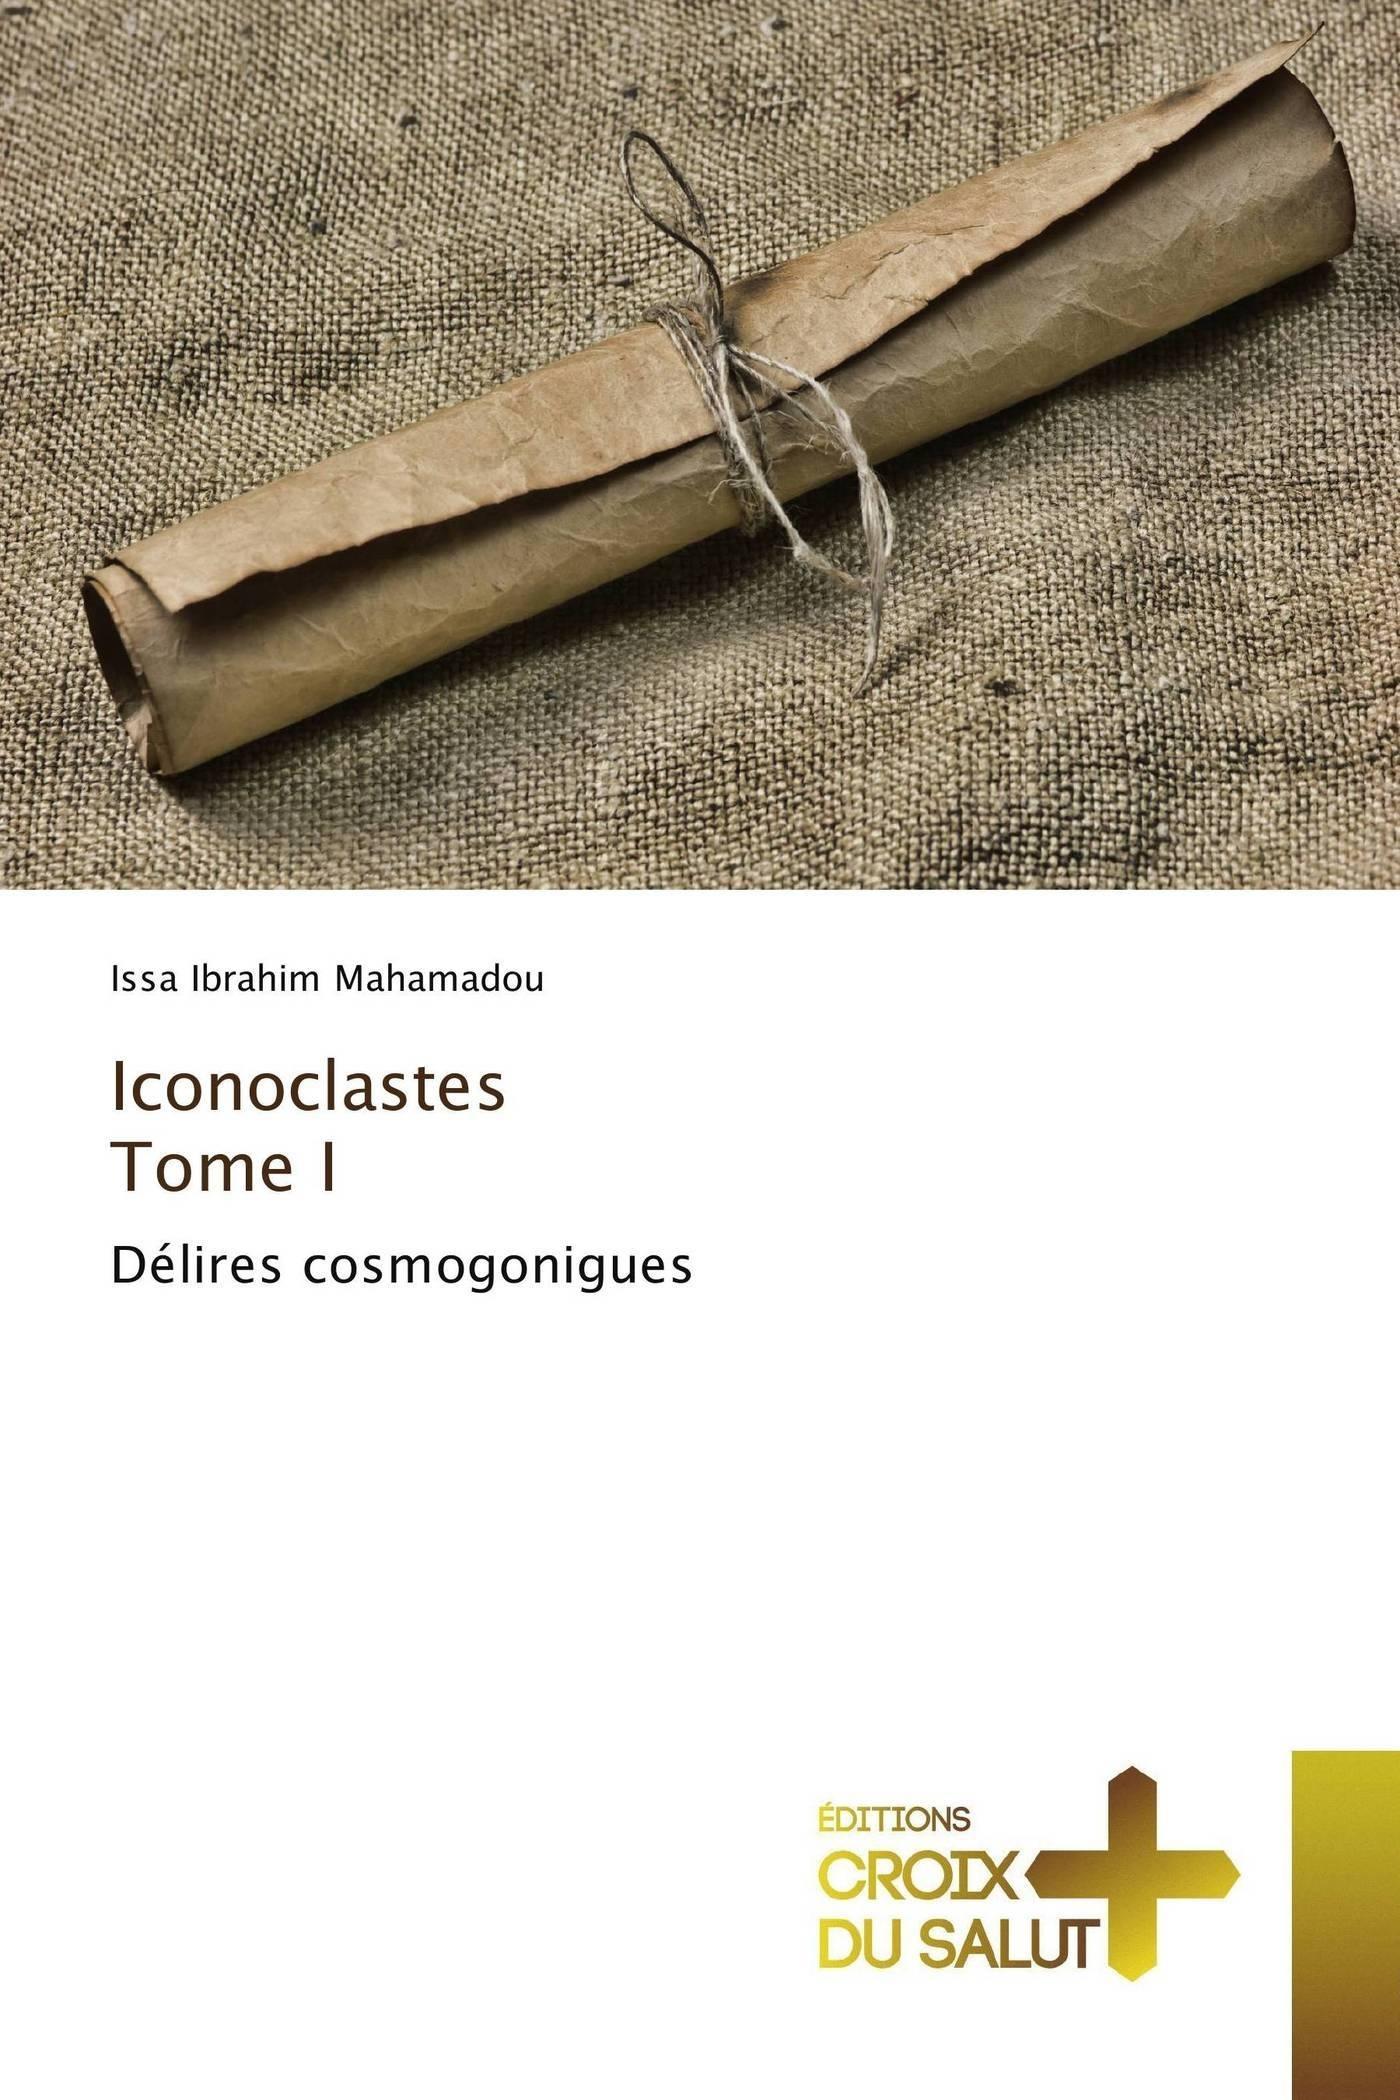 ICONOCLASTES TOME I